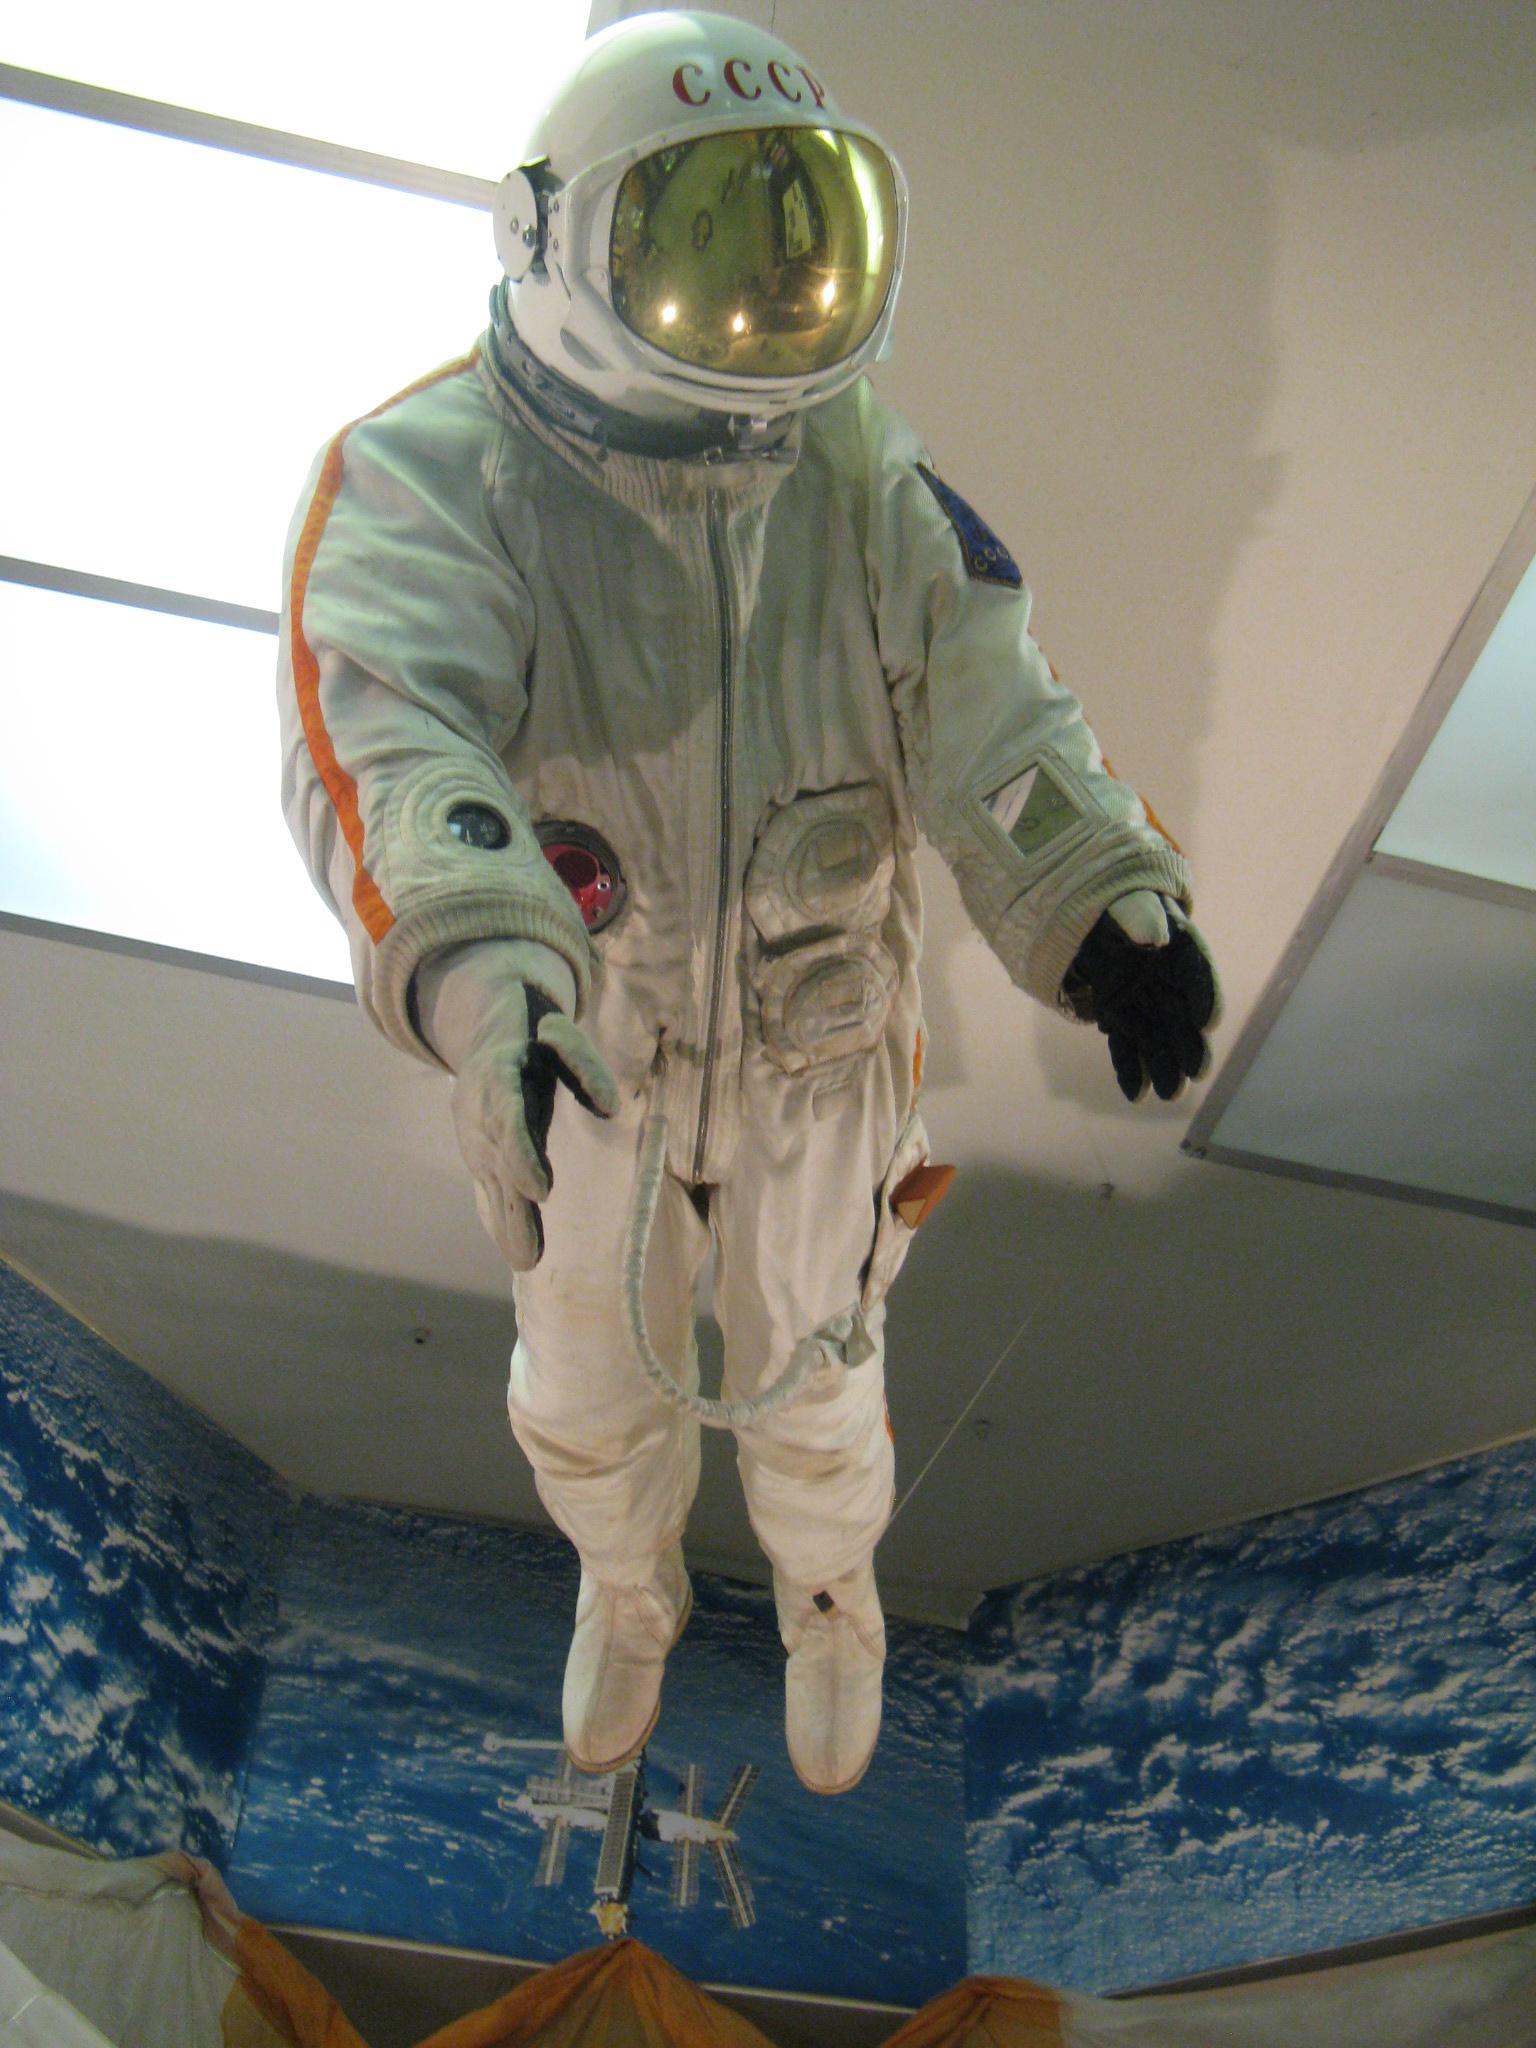 Skafandr do otevřeného kosmického prostoru z roku 1969.JPG